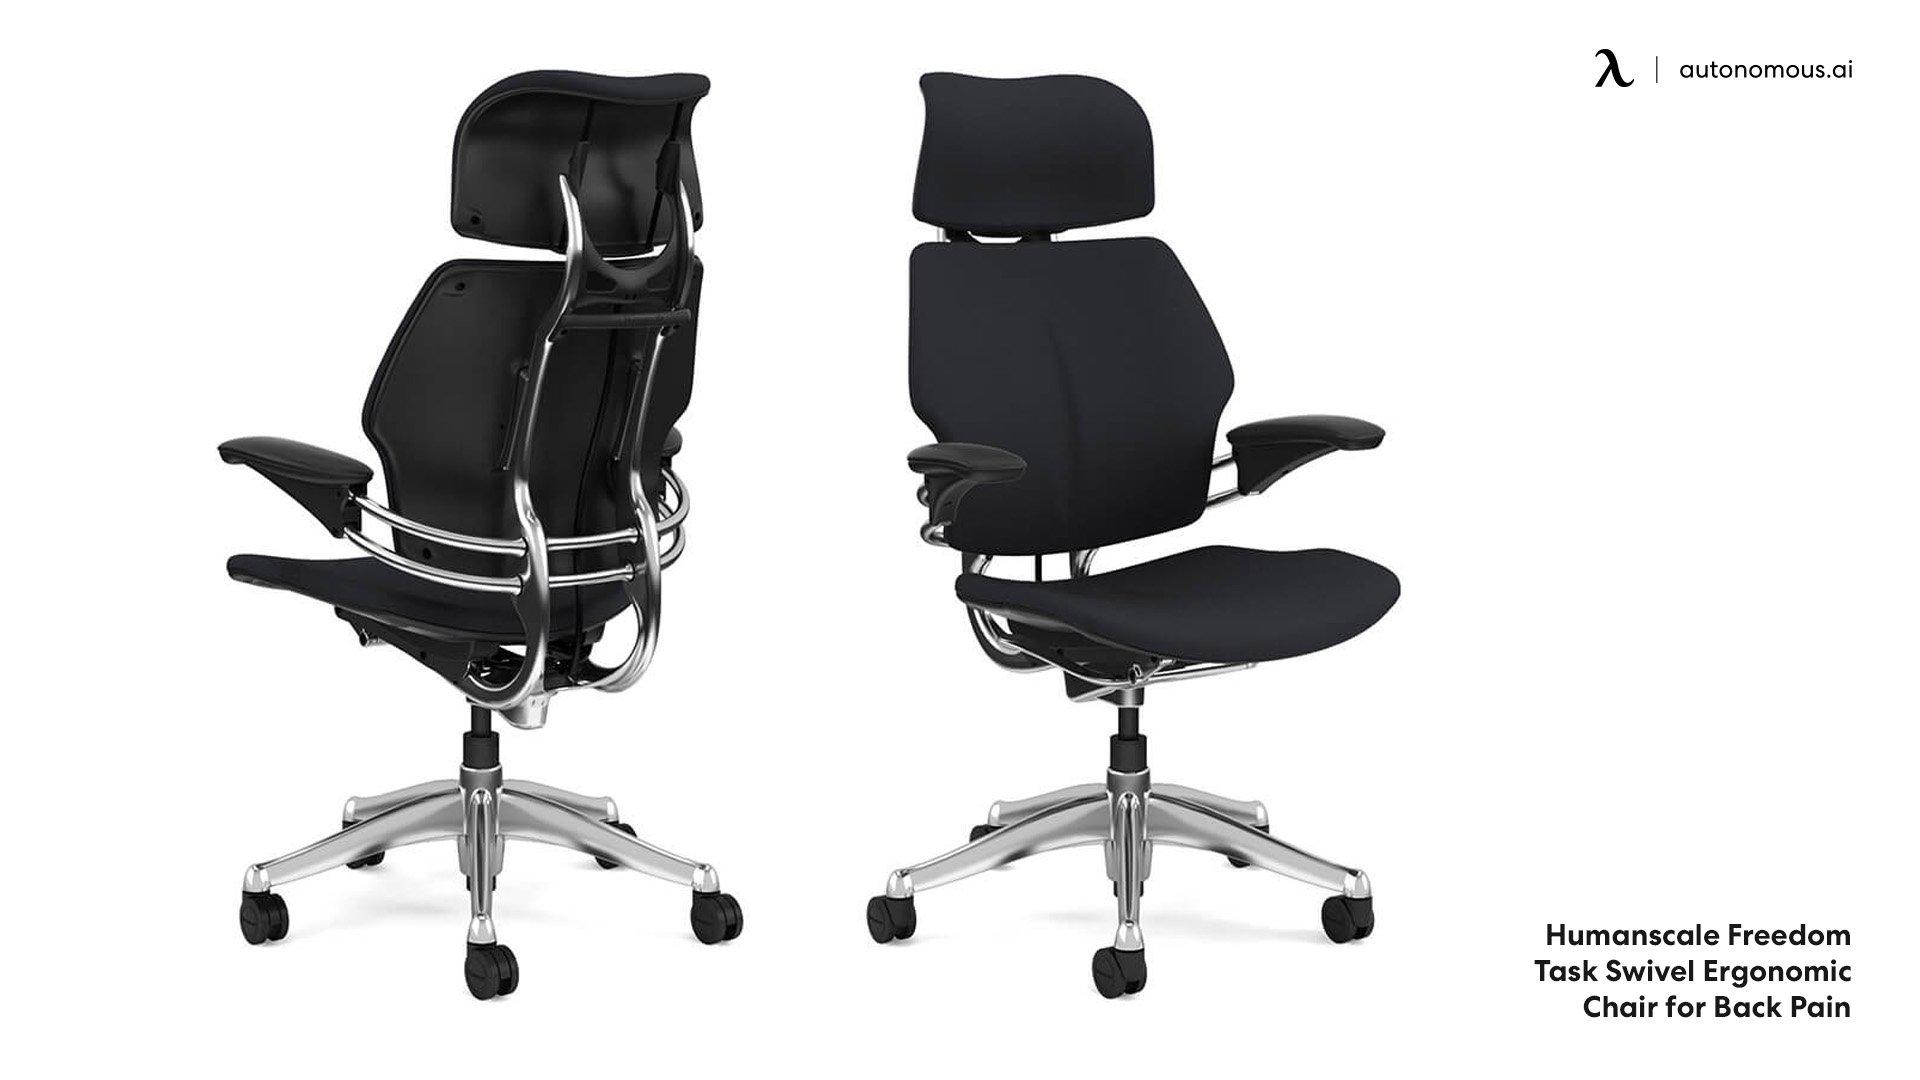 Swivel ergonomic chair